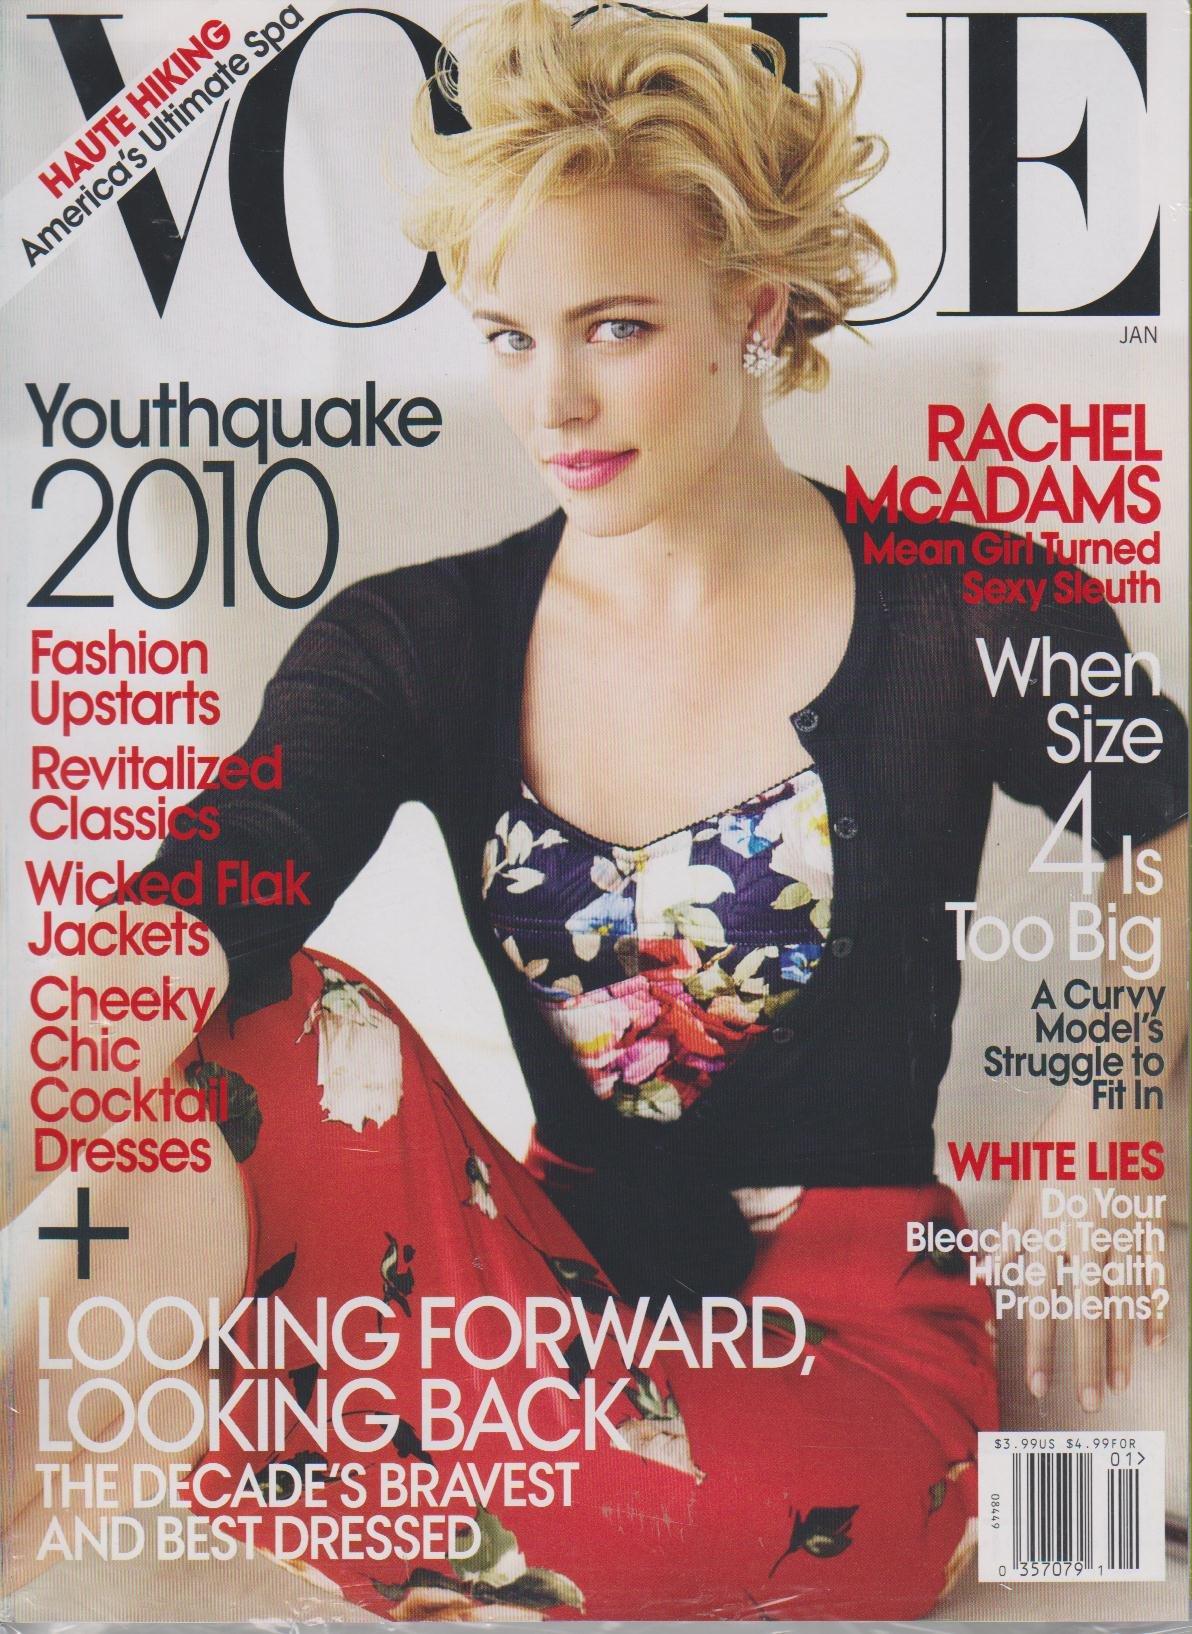 Vogue Magazine, January 2010: Rachel McAdams